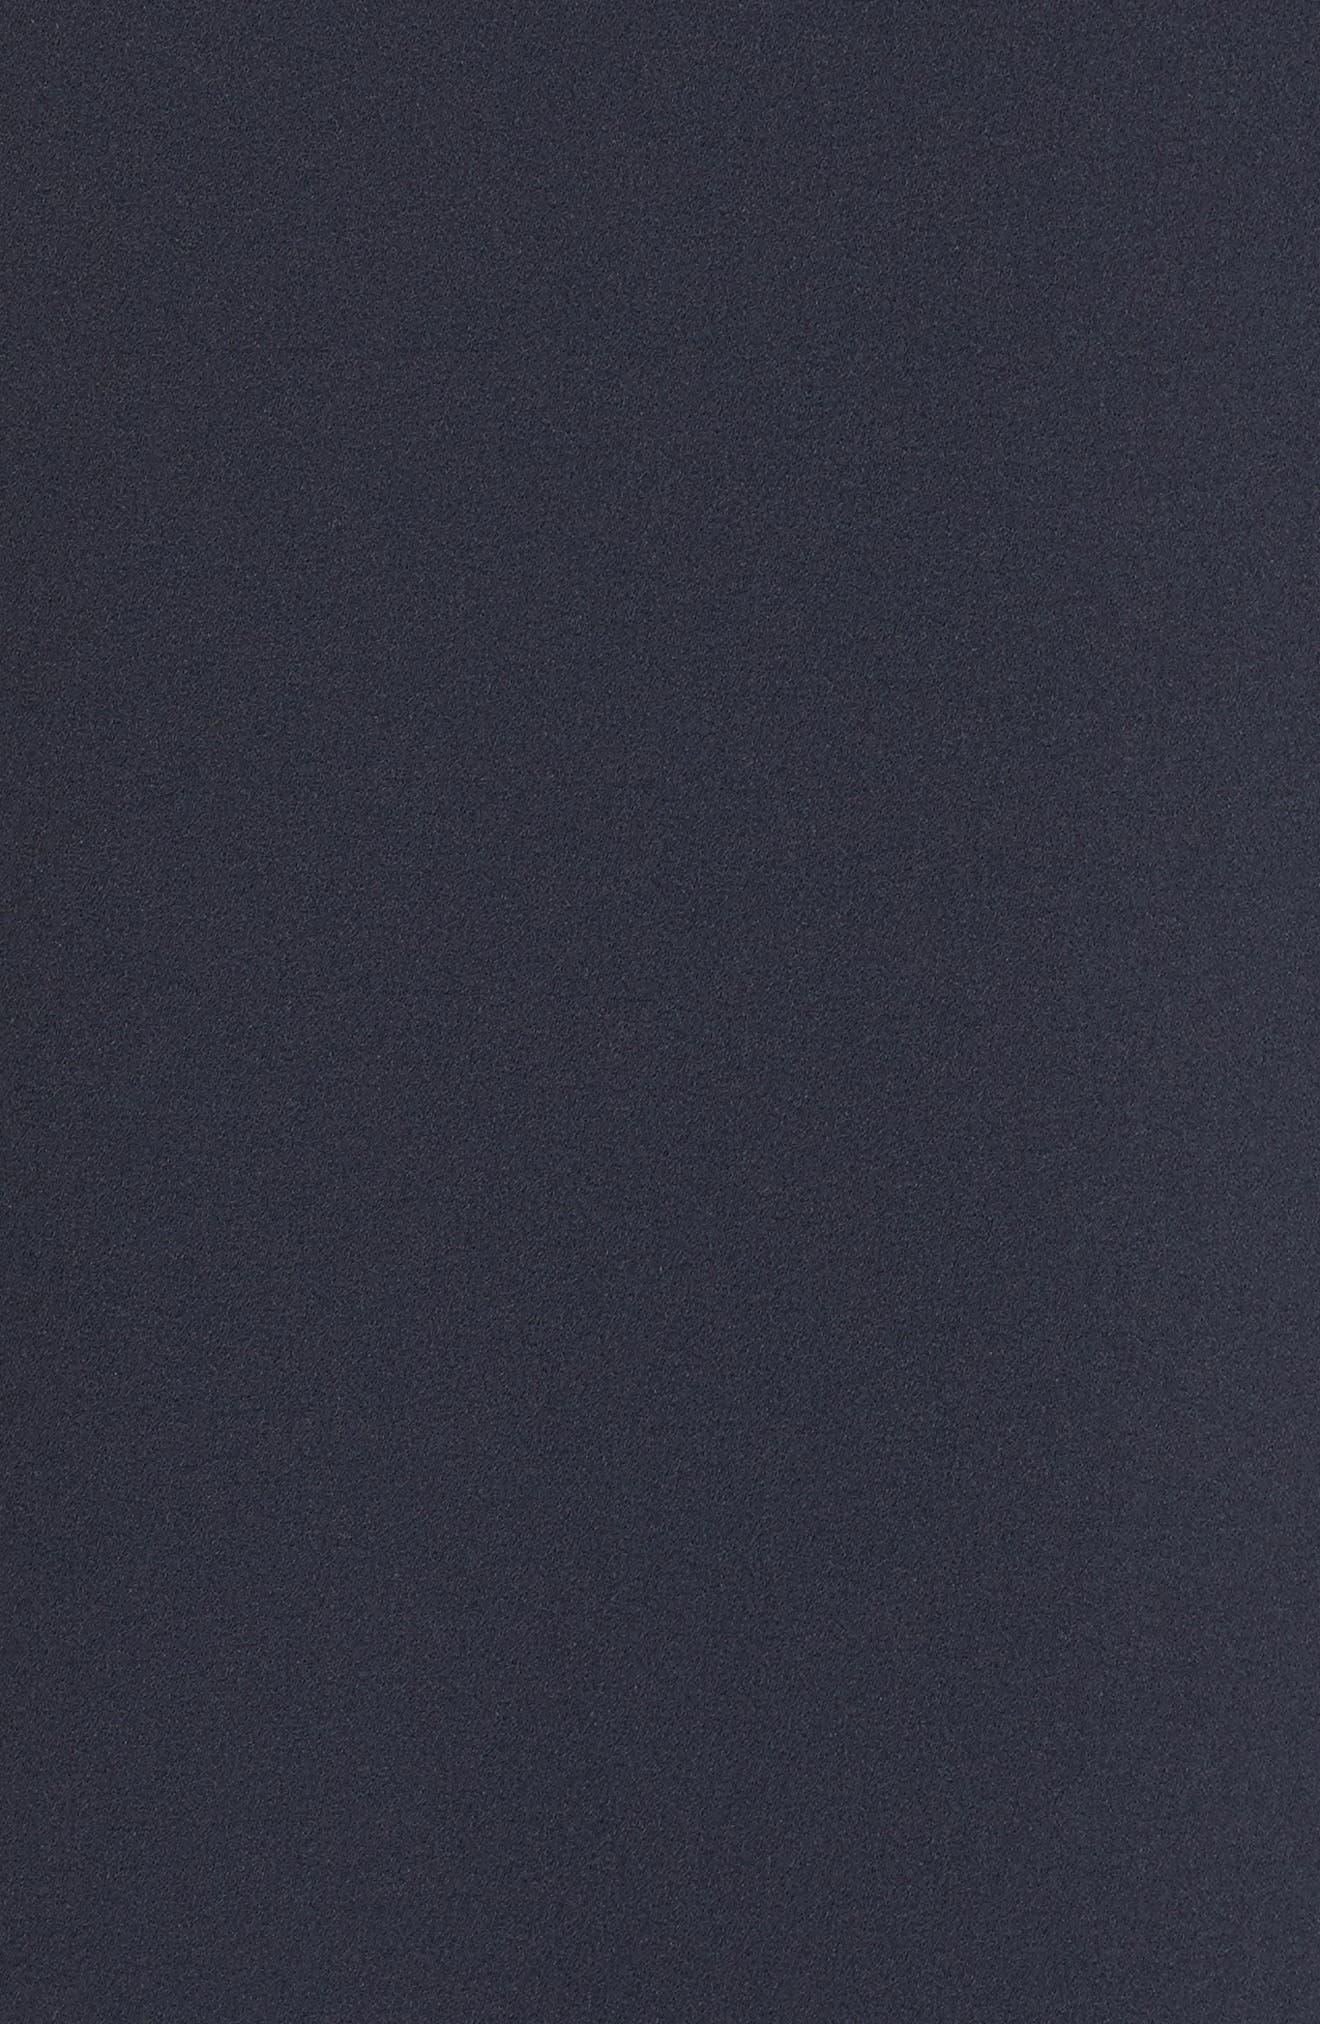 Stefani Ruffle Lace Dress,                             Alternate thumbnail 5, color,